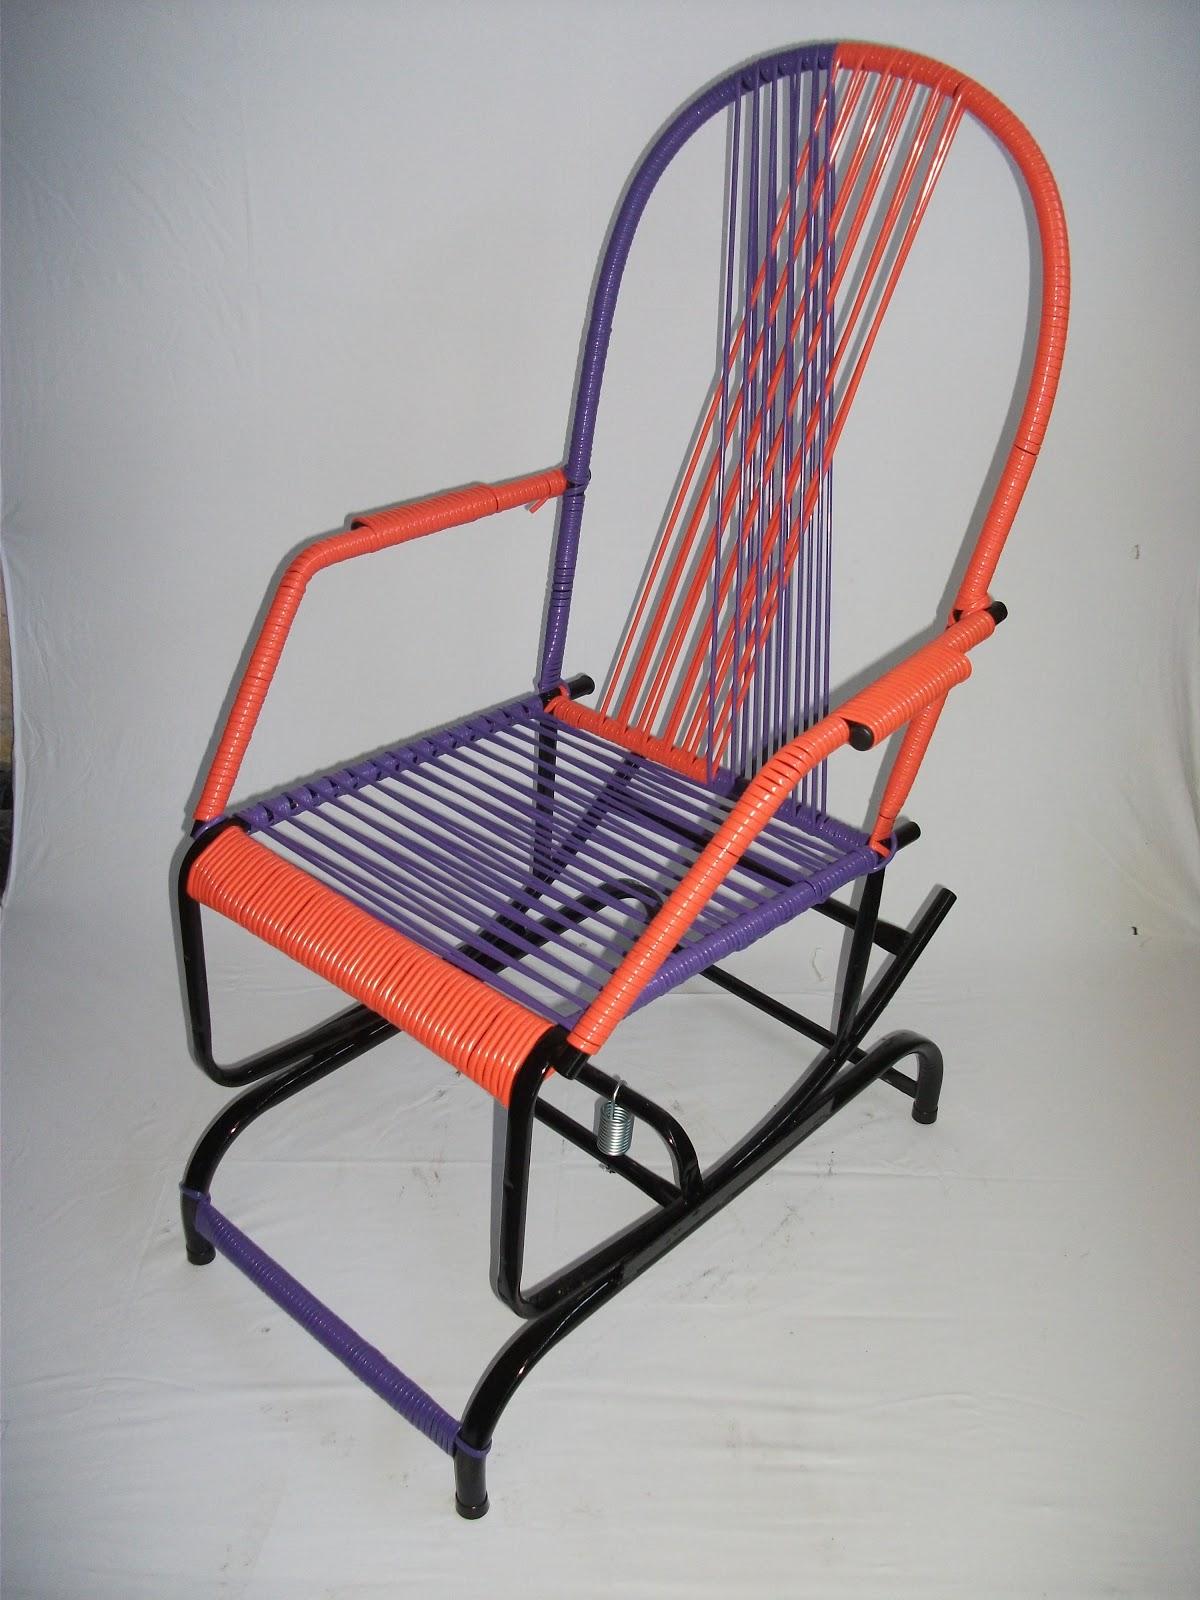 CADEIRAS DE BALANÇO: Cadeiras De Mola #B23019 1200x1600